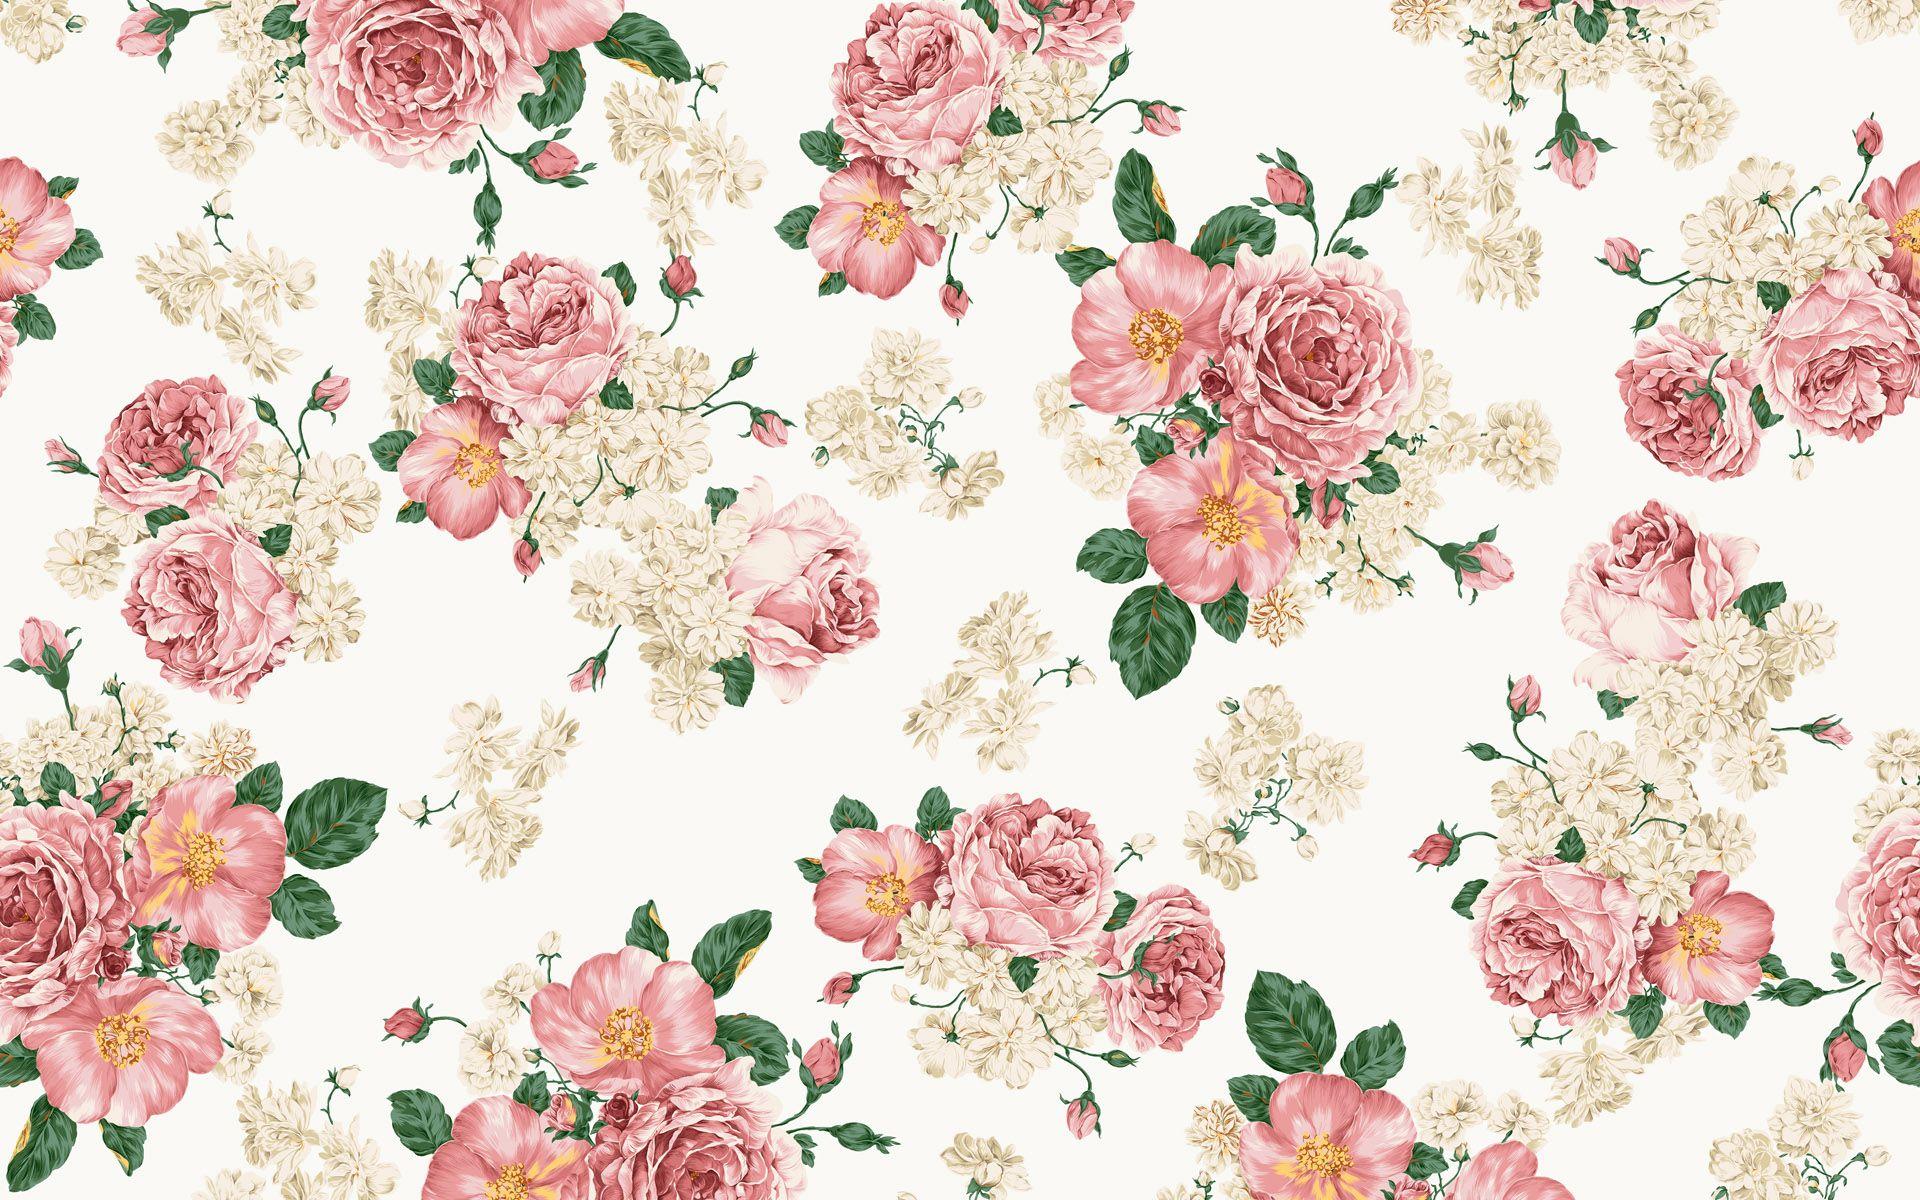 Flower Pattern Design Wallpaper High Resolution with HD